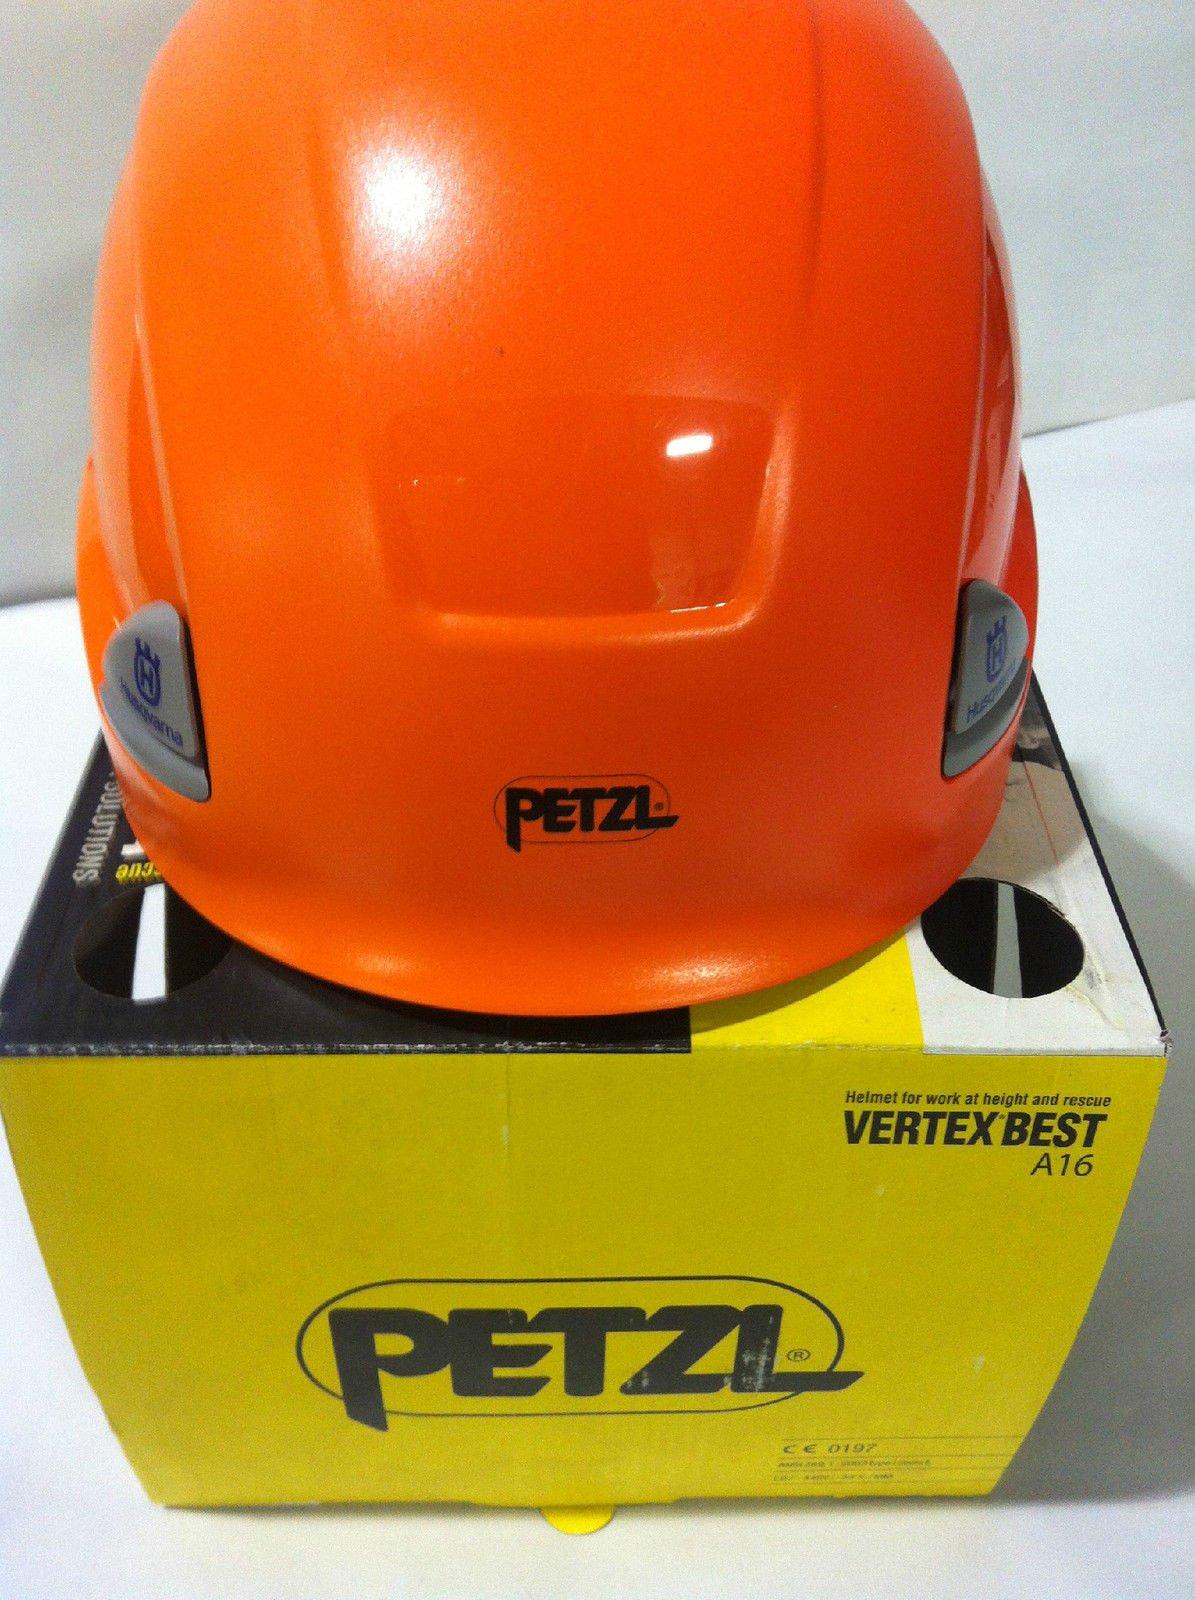 Genuine Husqvarna 531309471 Petzl Vertex Arborist Work Rescue Helmet NEW ,product_by: powered_by_moyer ,ket120221961630143